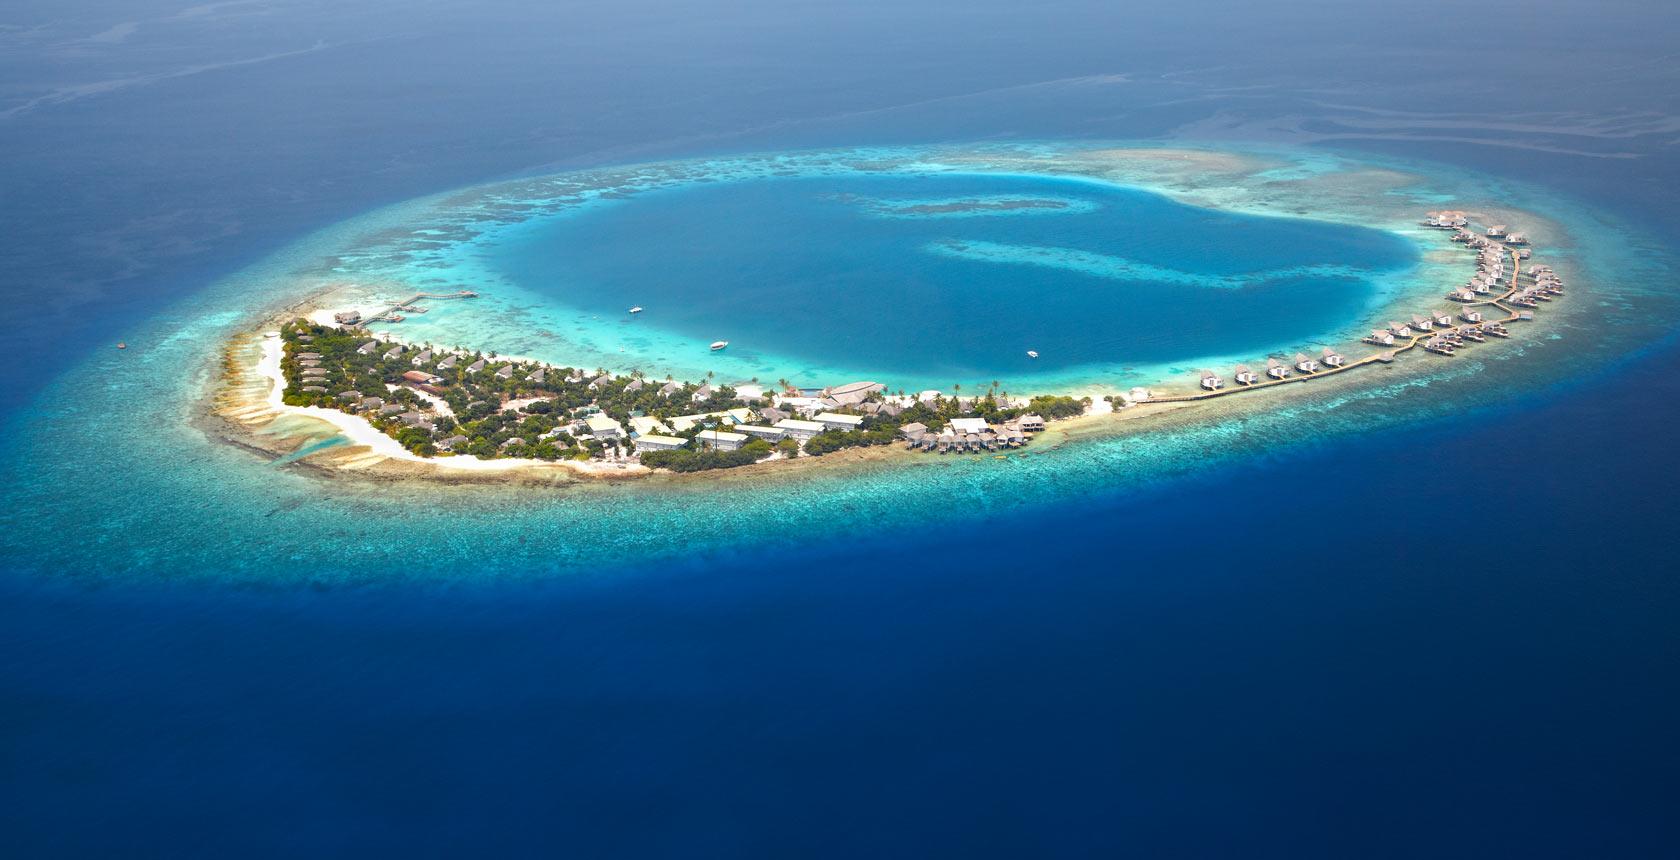 viceroy maldives resort spa 01 myhouseidea. Black Bedroom Furniture Sets. Home Design Ideas